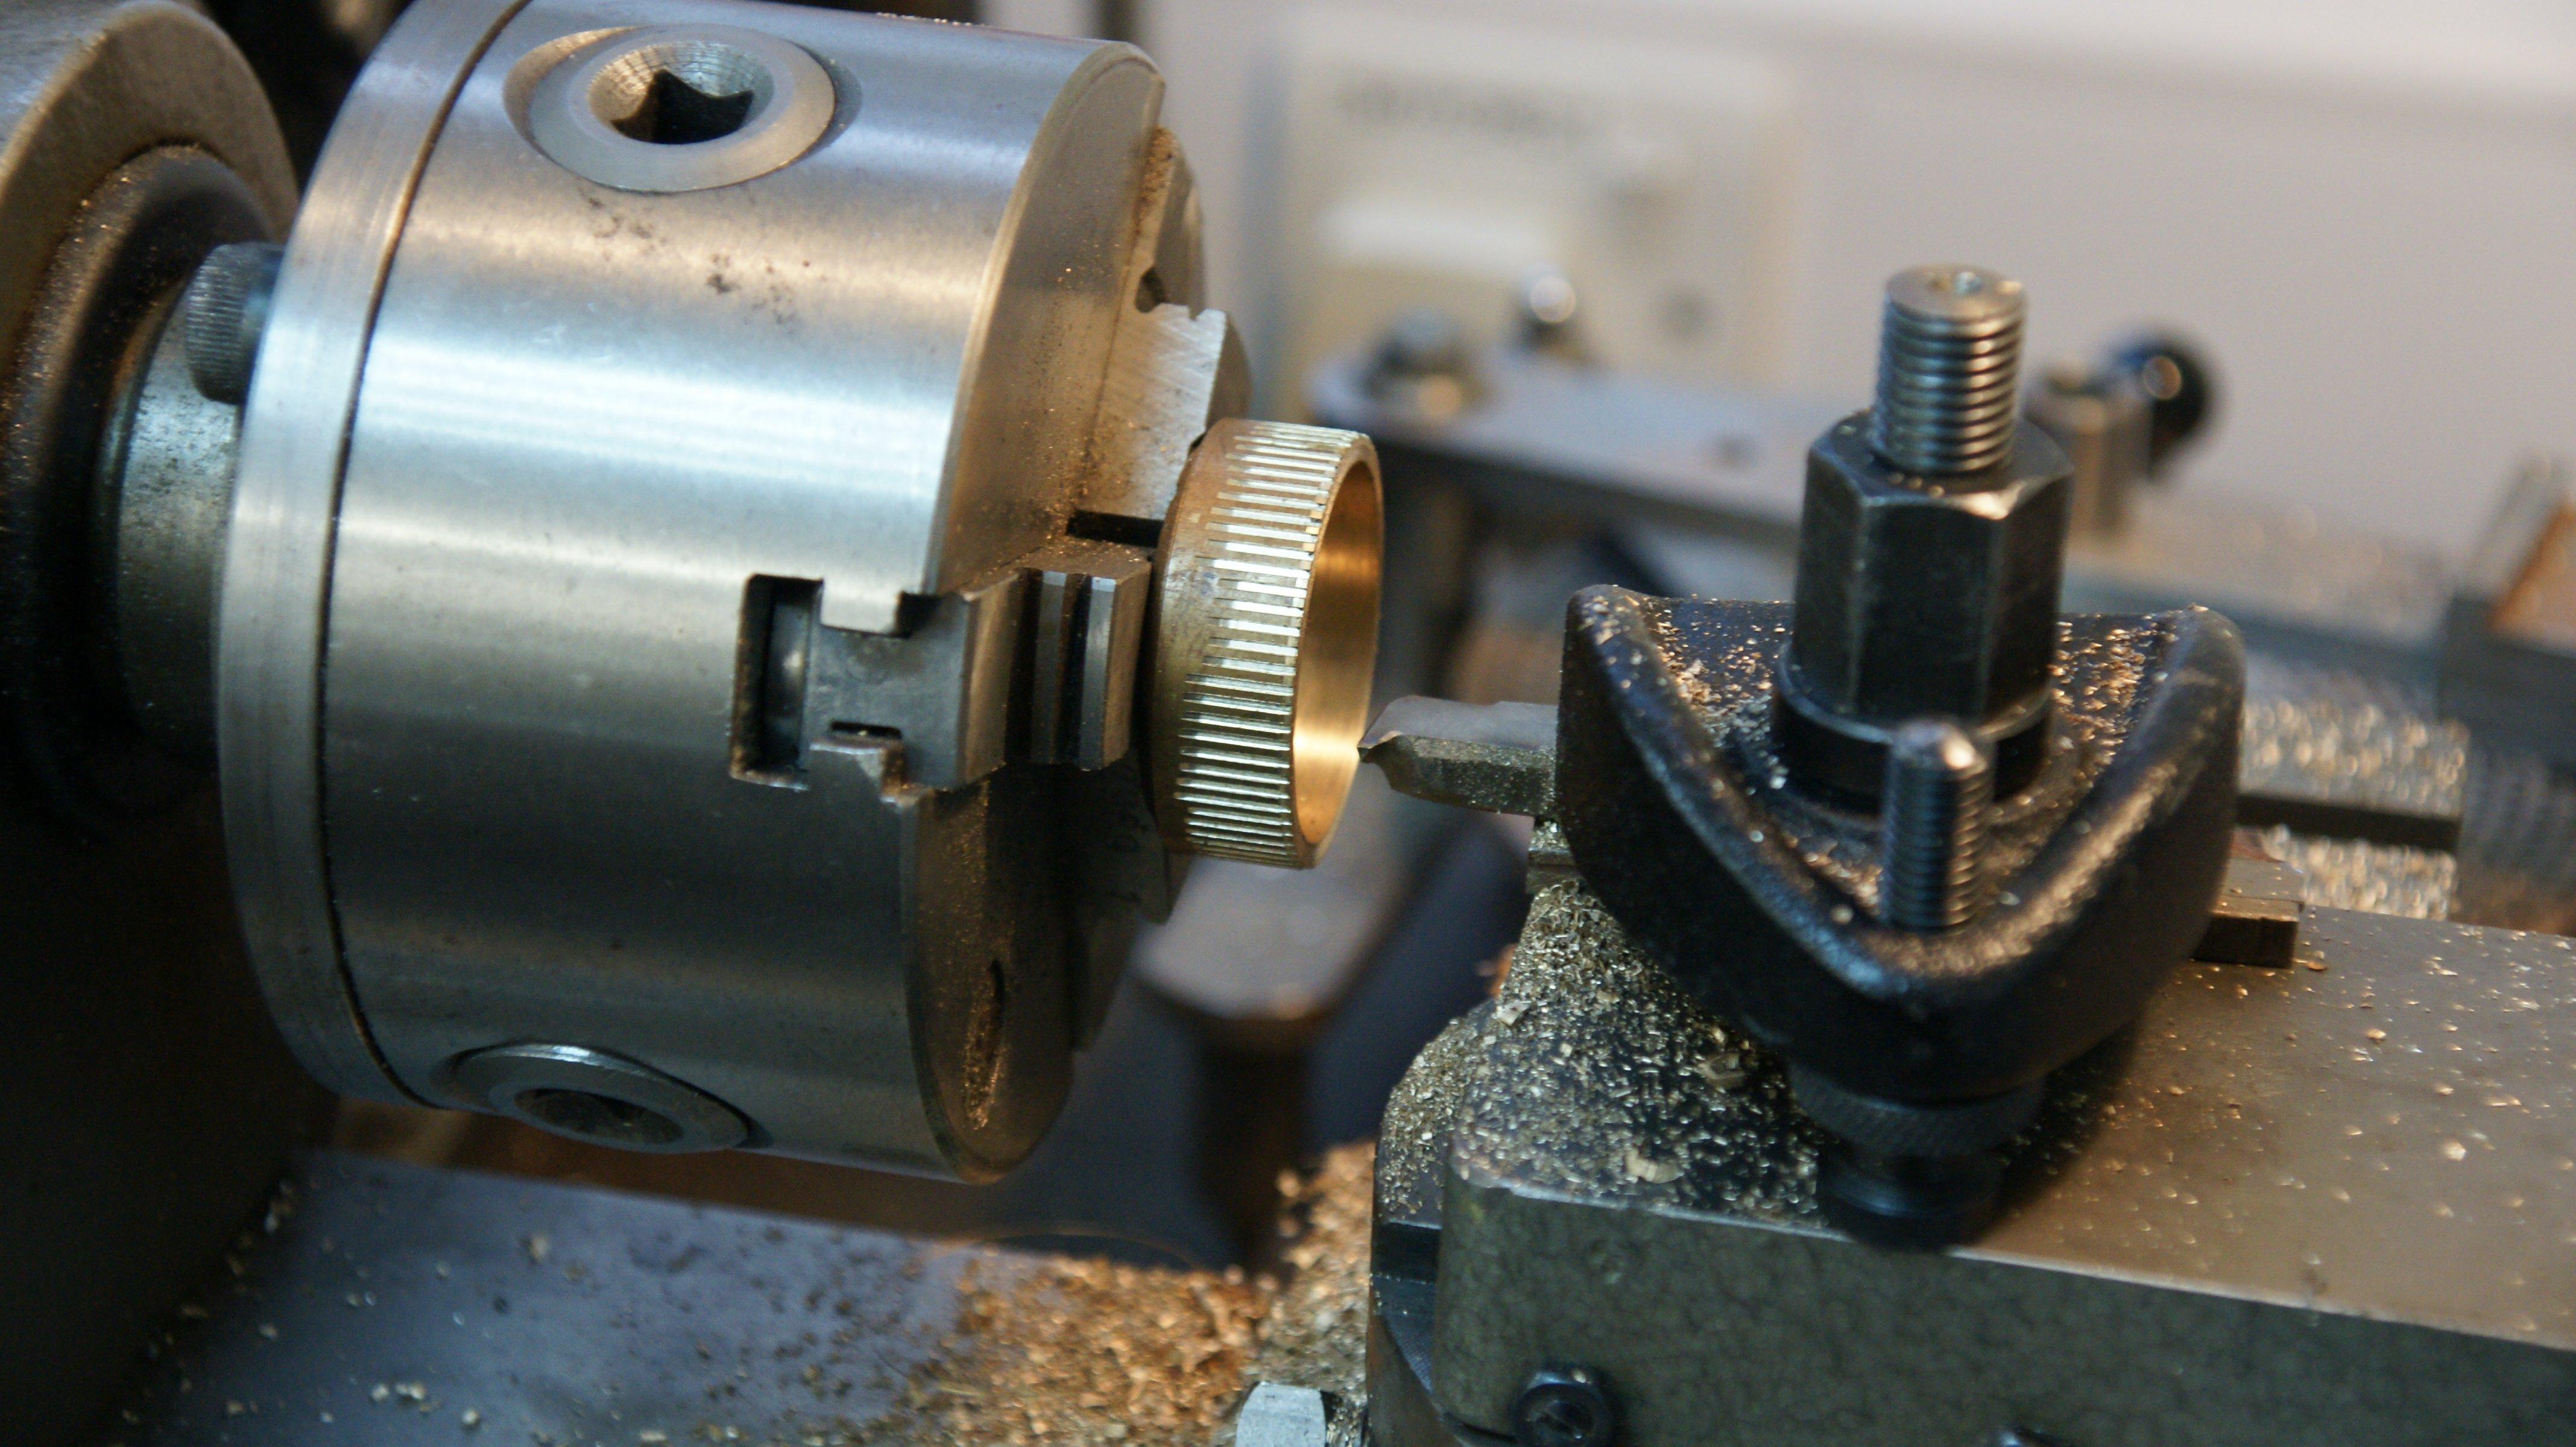 Equipment for watch repairs